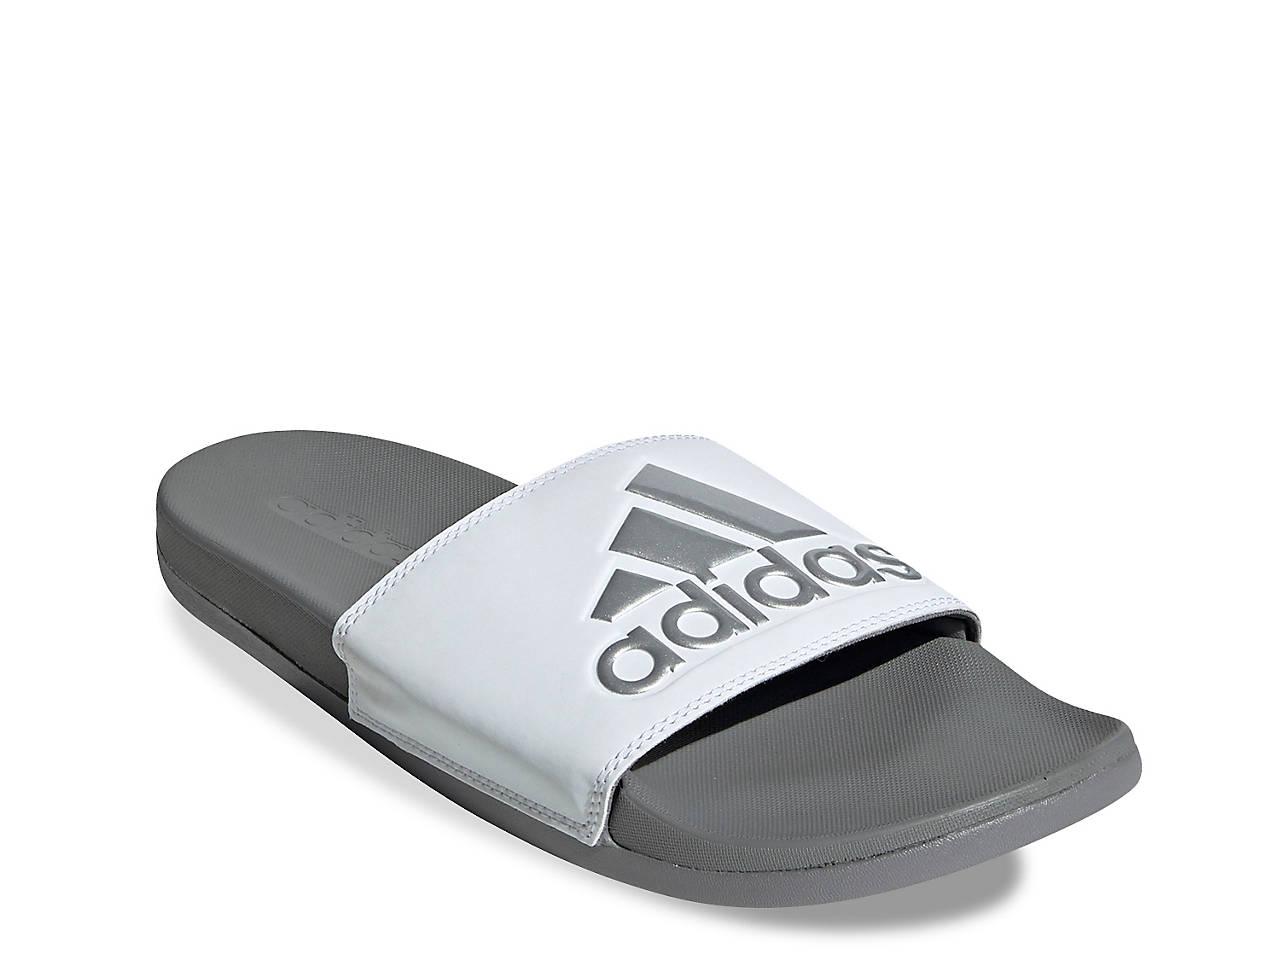 25fda1c58c2 adidas Adilette Comfort Slide Sandal - Men s Men s Shoes